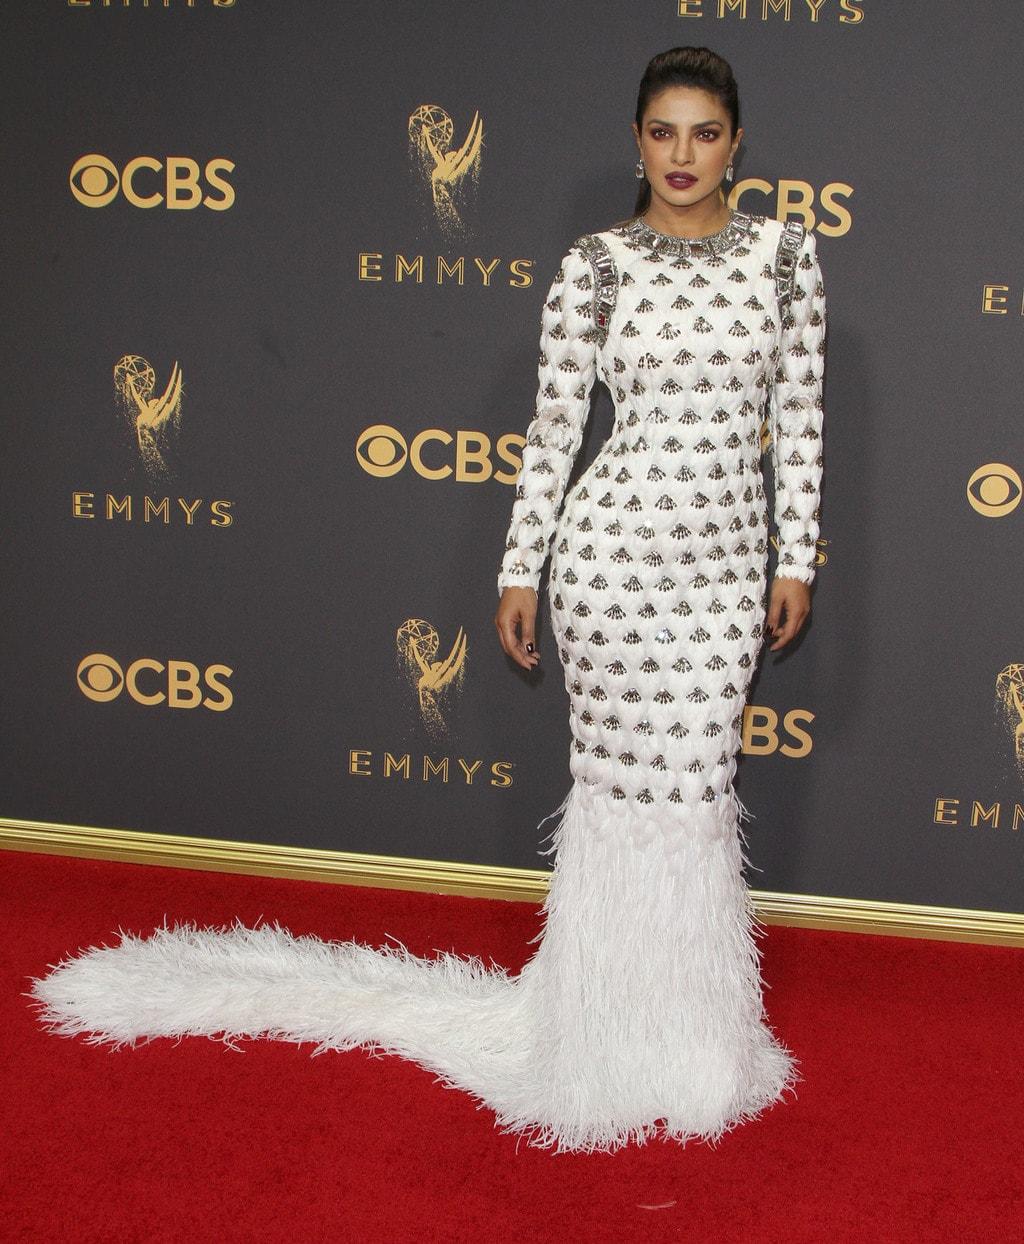 Priyanka Chopra in Balmain at the 2017 Emmy Awards